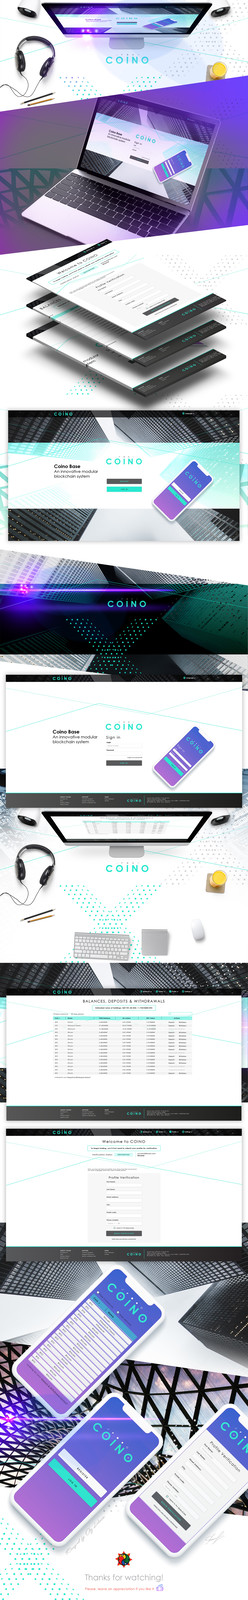 COINO | Site Concept ui design web design